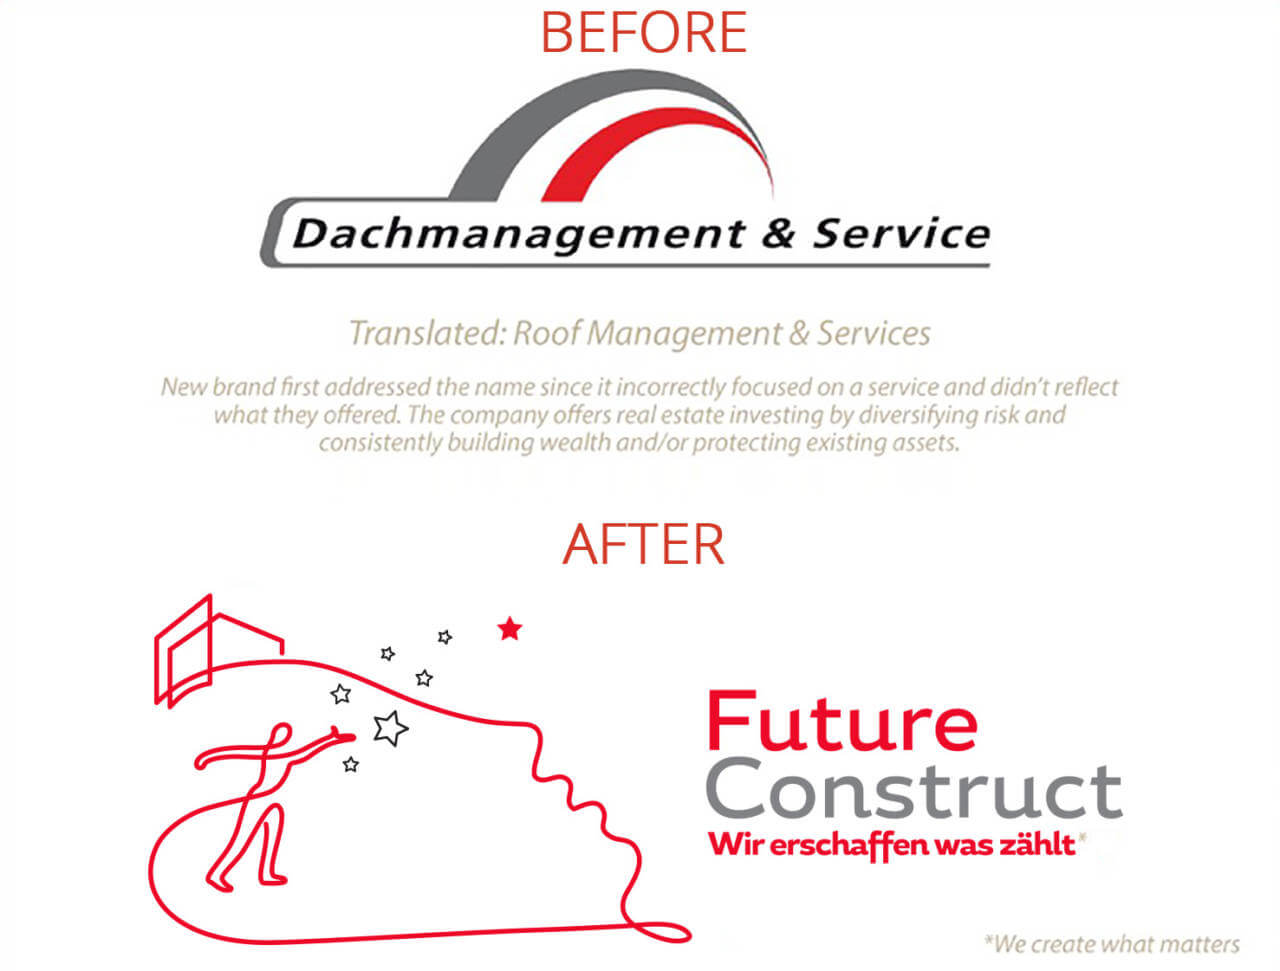 Branding for Munich company by David Brier